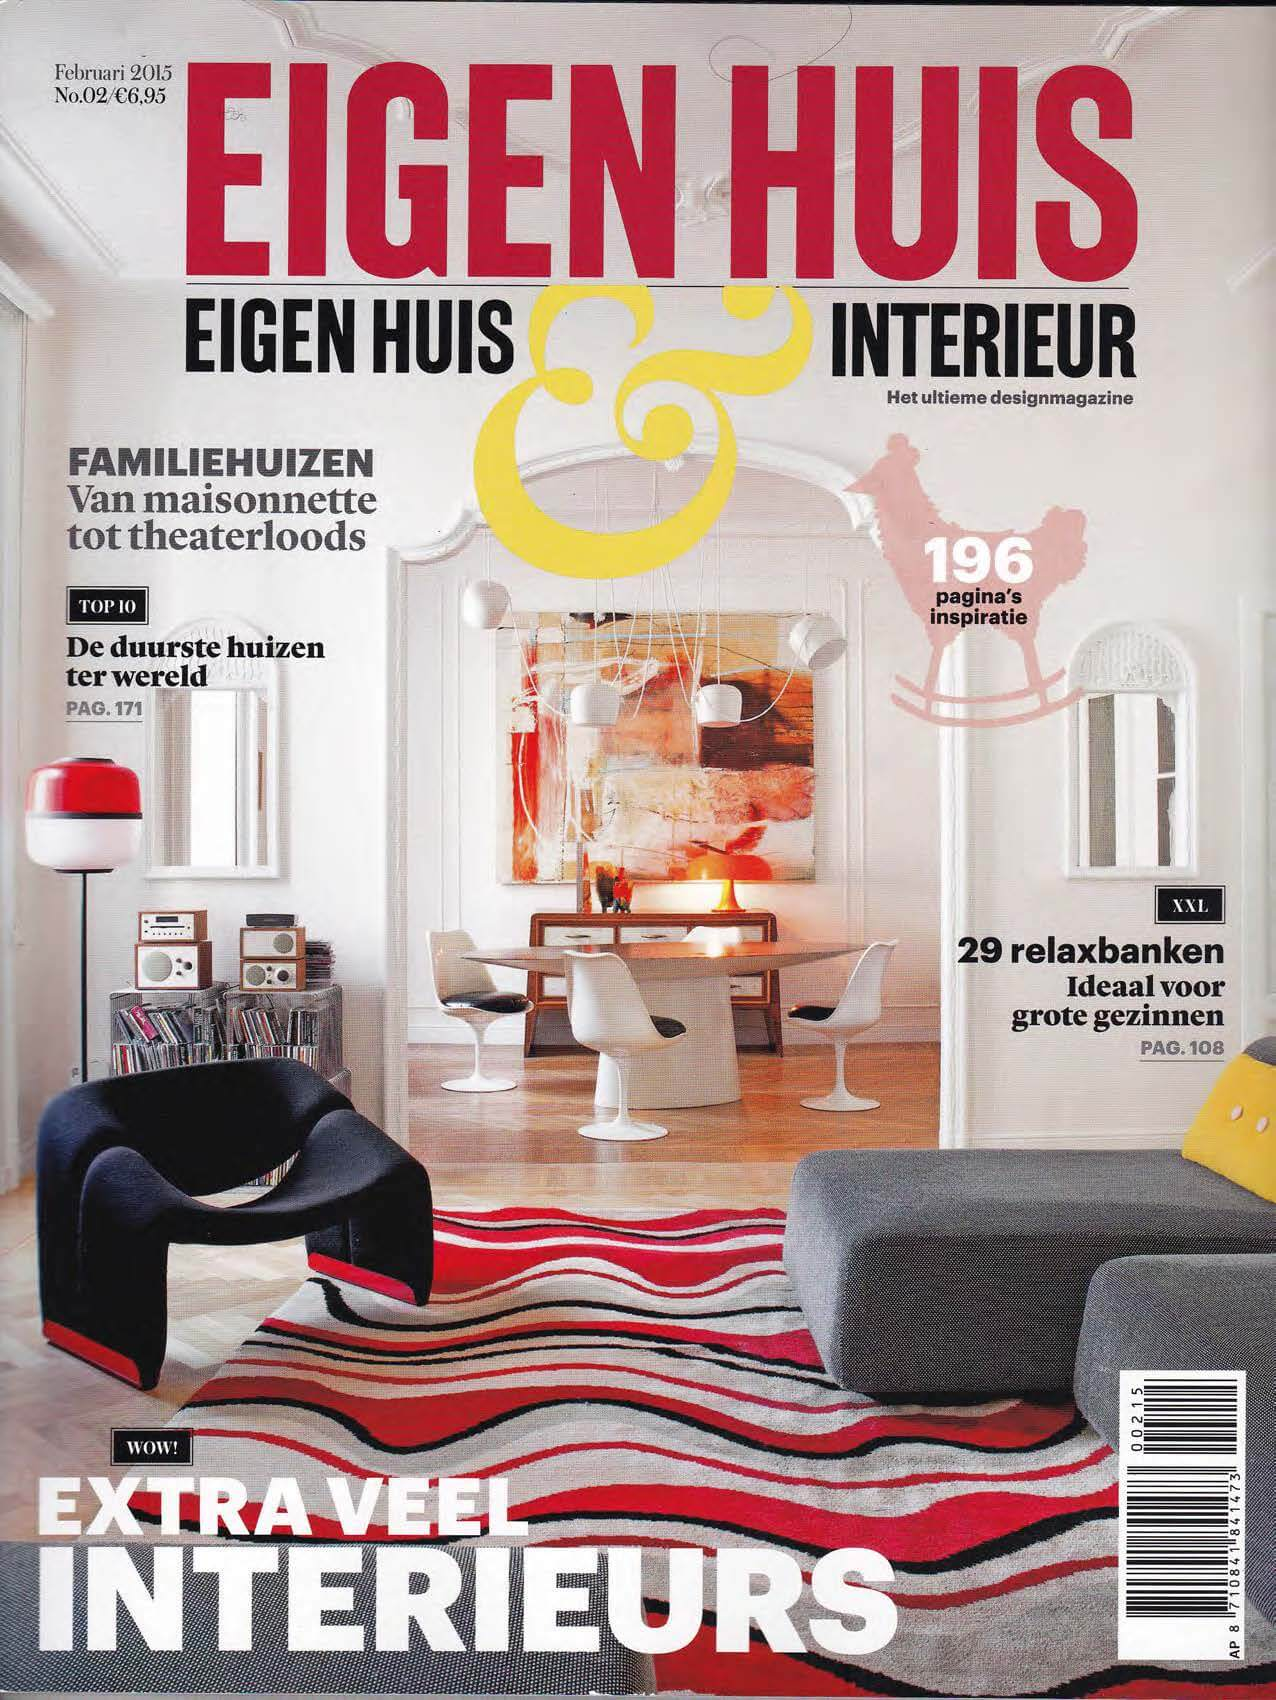 Suite wood eigen huis interieur feb 2015 for Huis en interieur